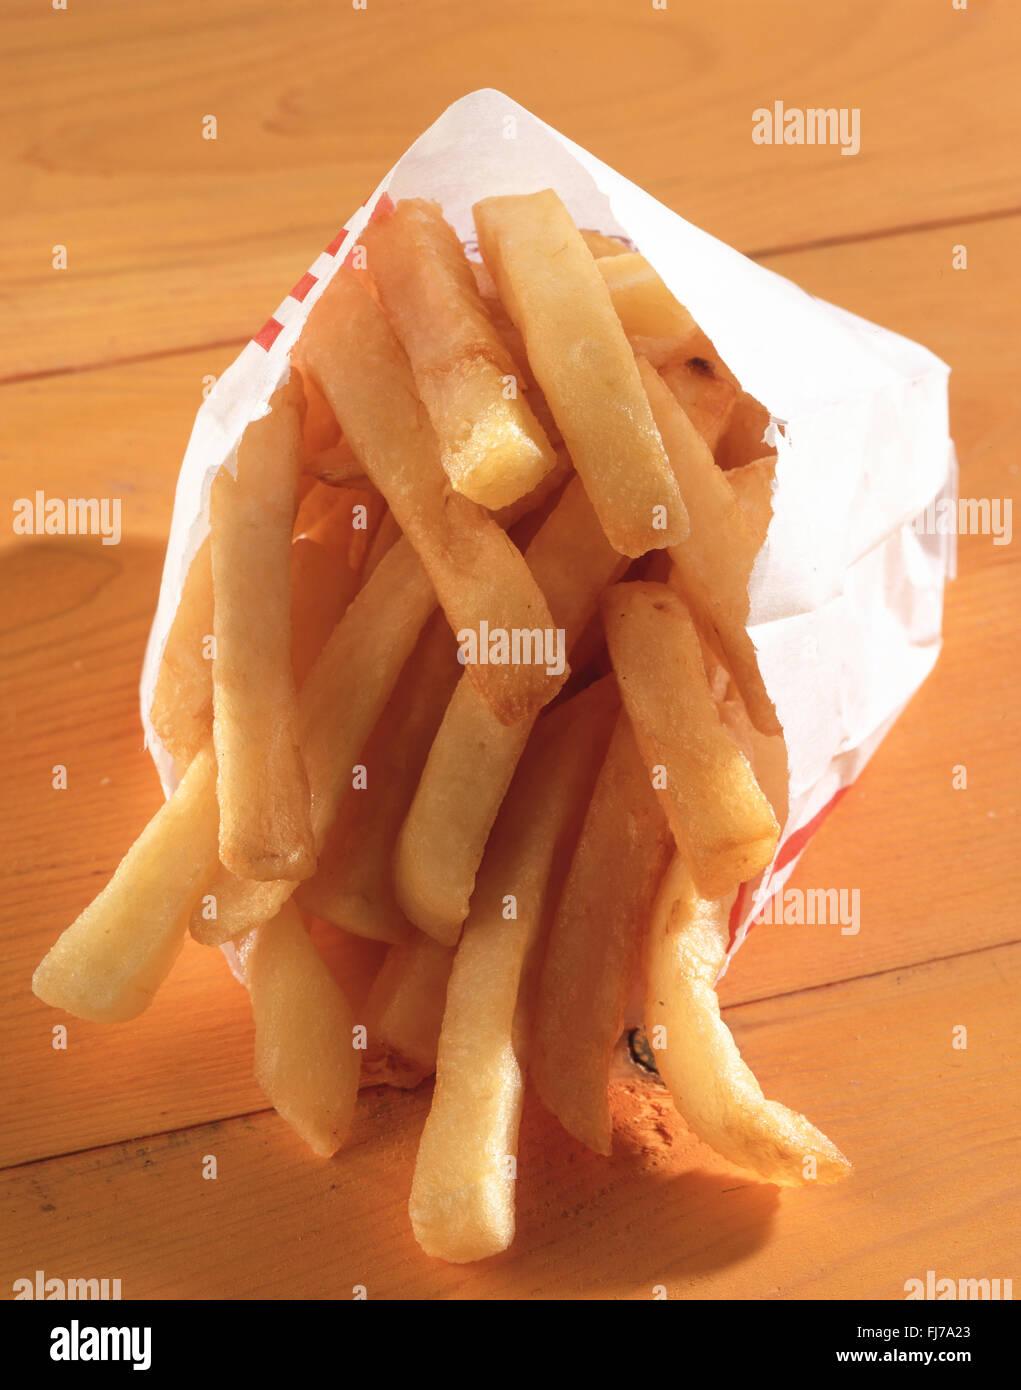 Petit paquet de frites de Kentucy Fried Chicken, Ashford, Surrey, Angleterre, Royaume-Uni Photo Stock